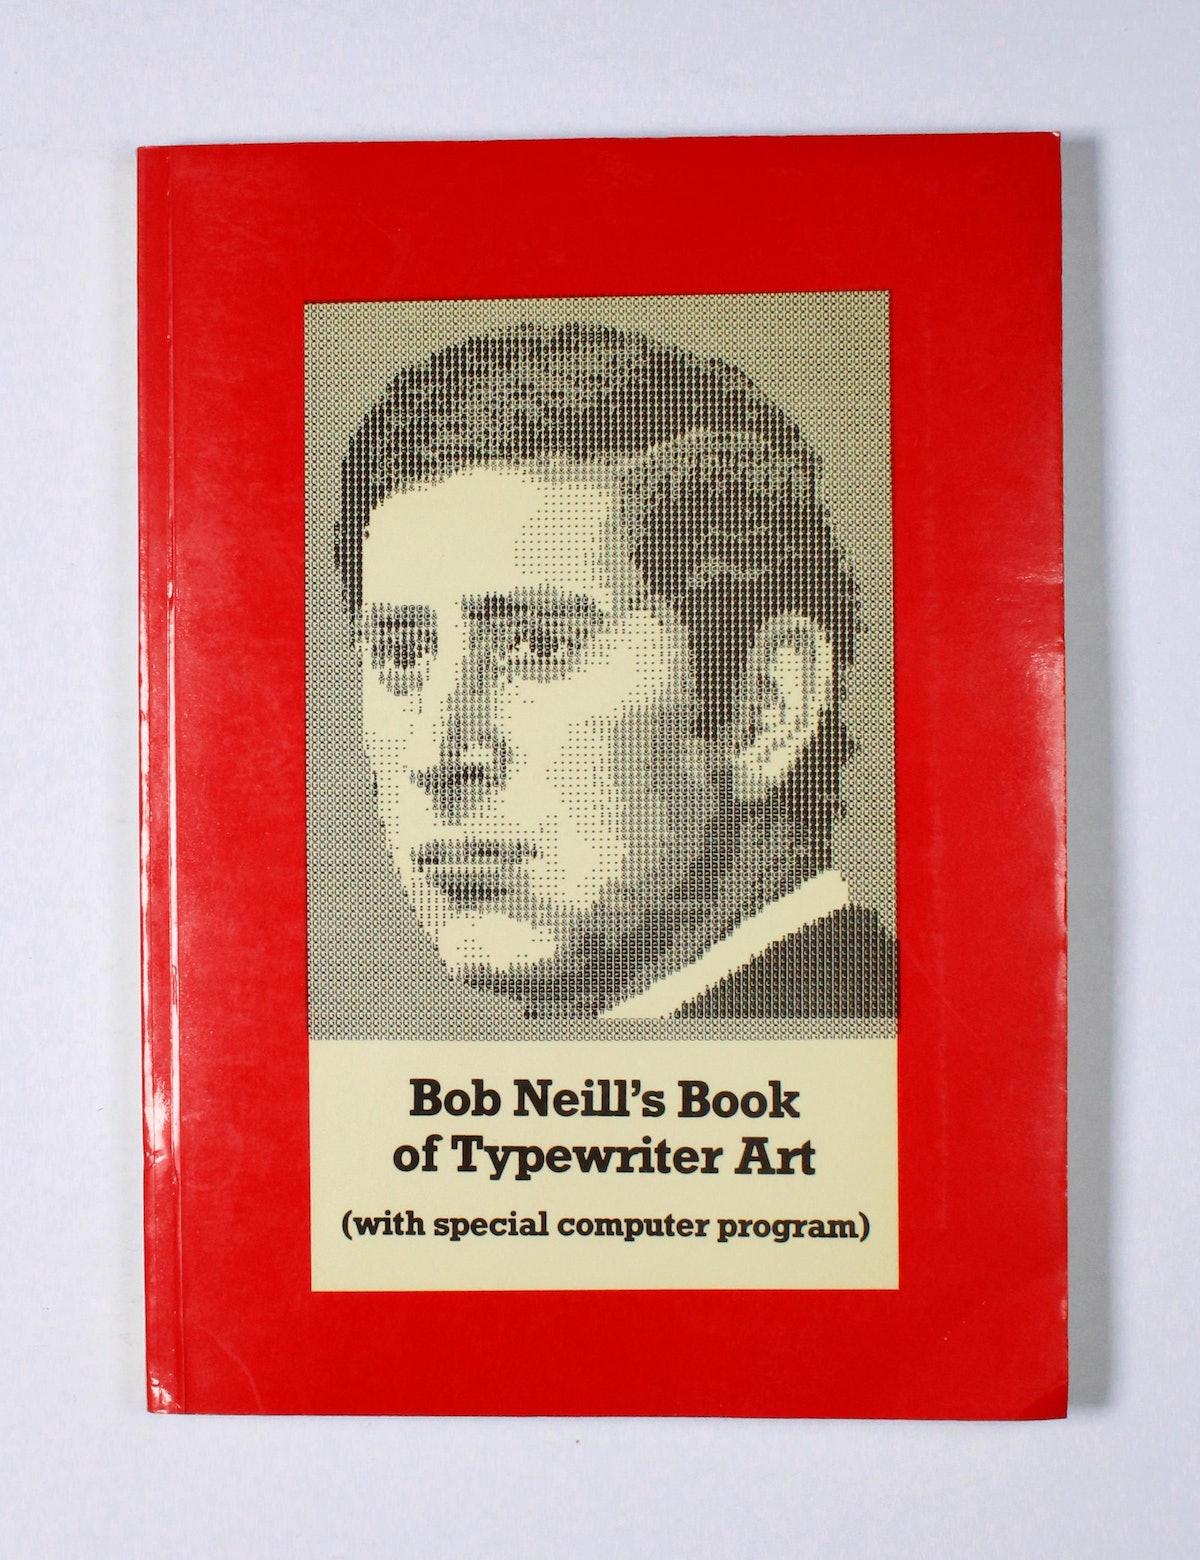 Bob Neill's Book of Typewriter Art